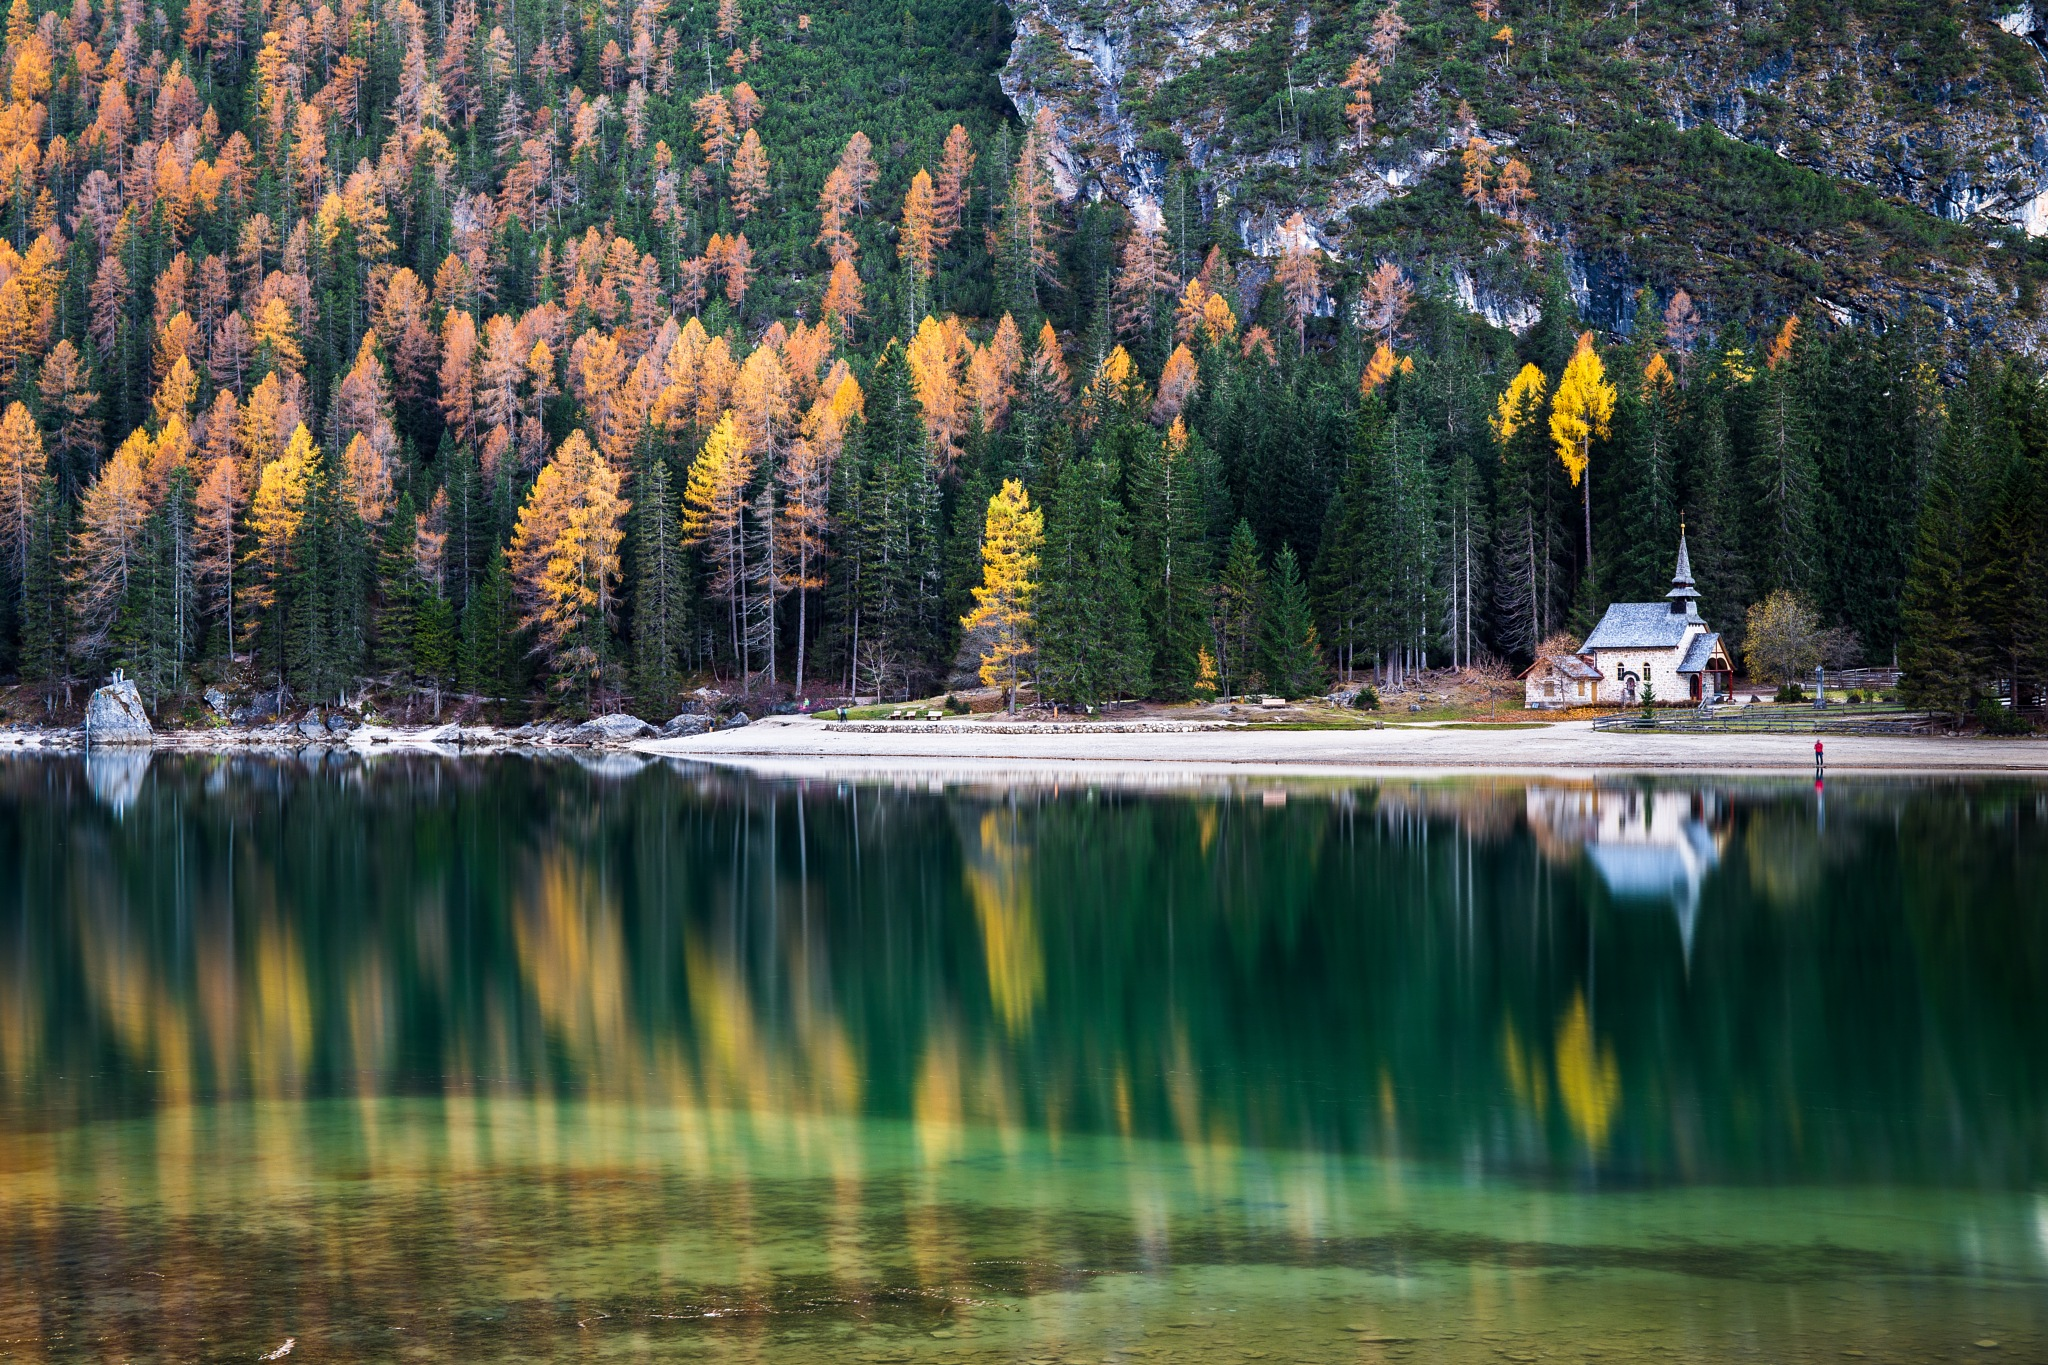 Braies Lake - Italy by Giorgino23